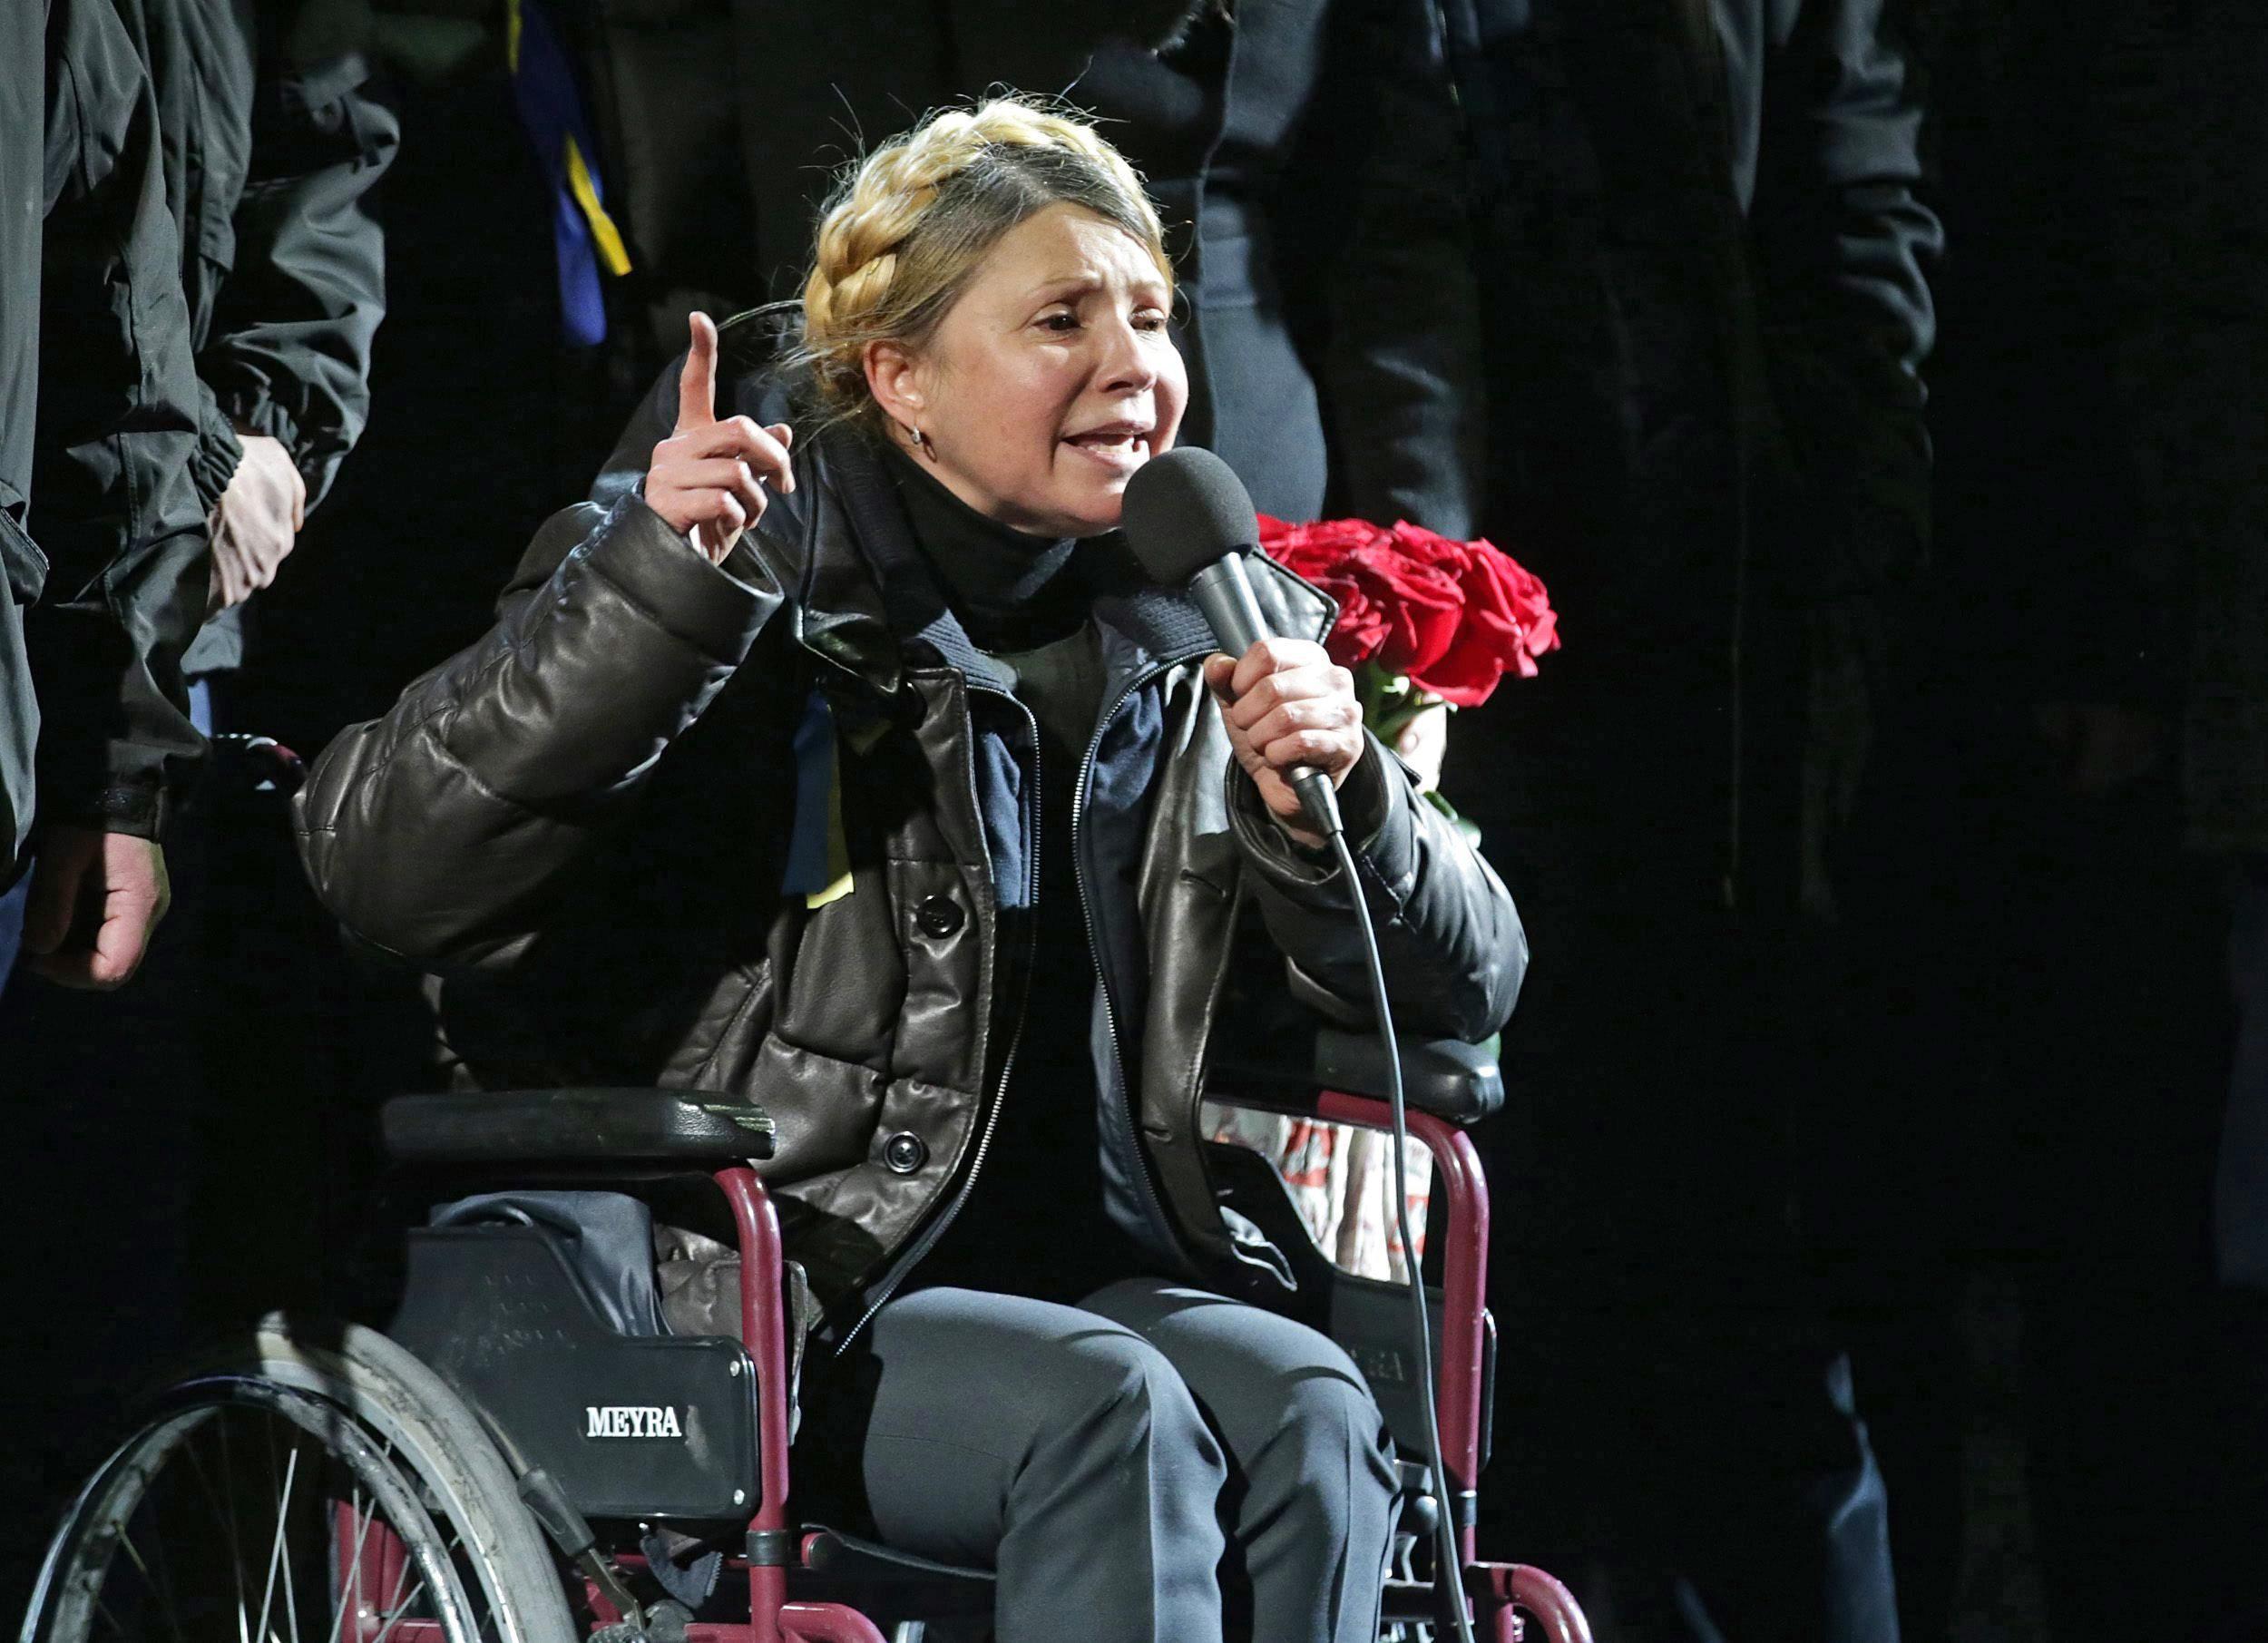 Image: Tymoshenko addresses crowd on Independence Square in Kiev